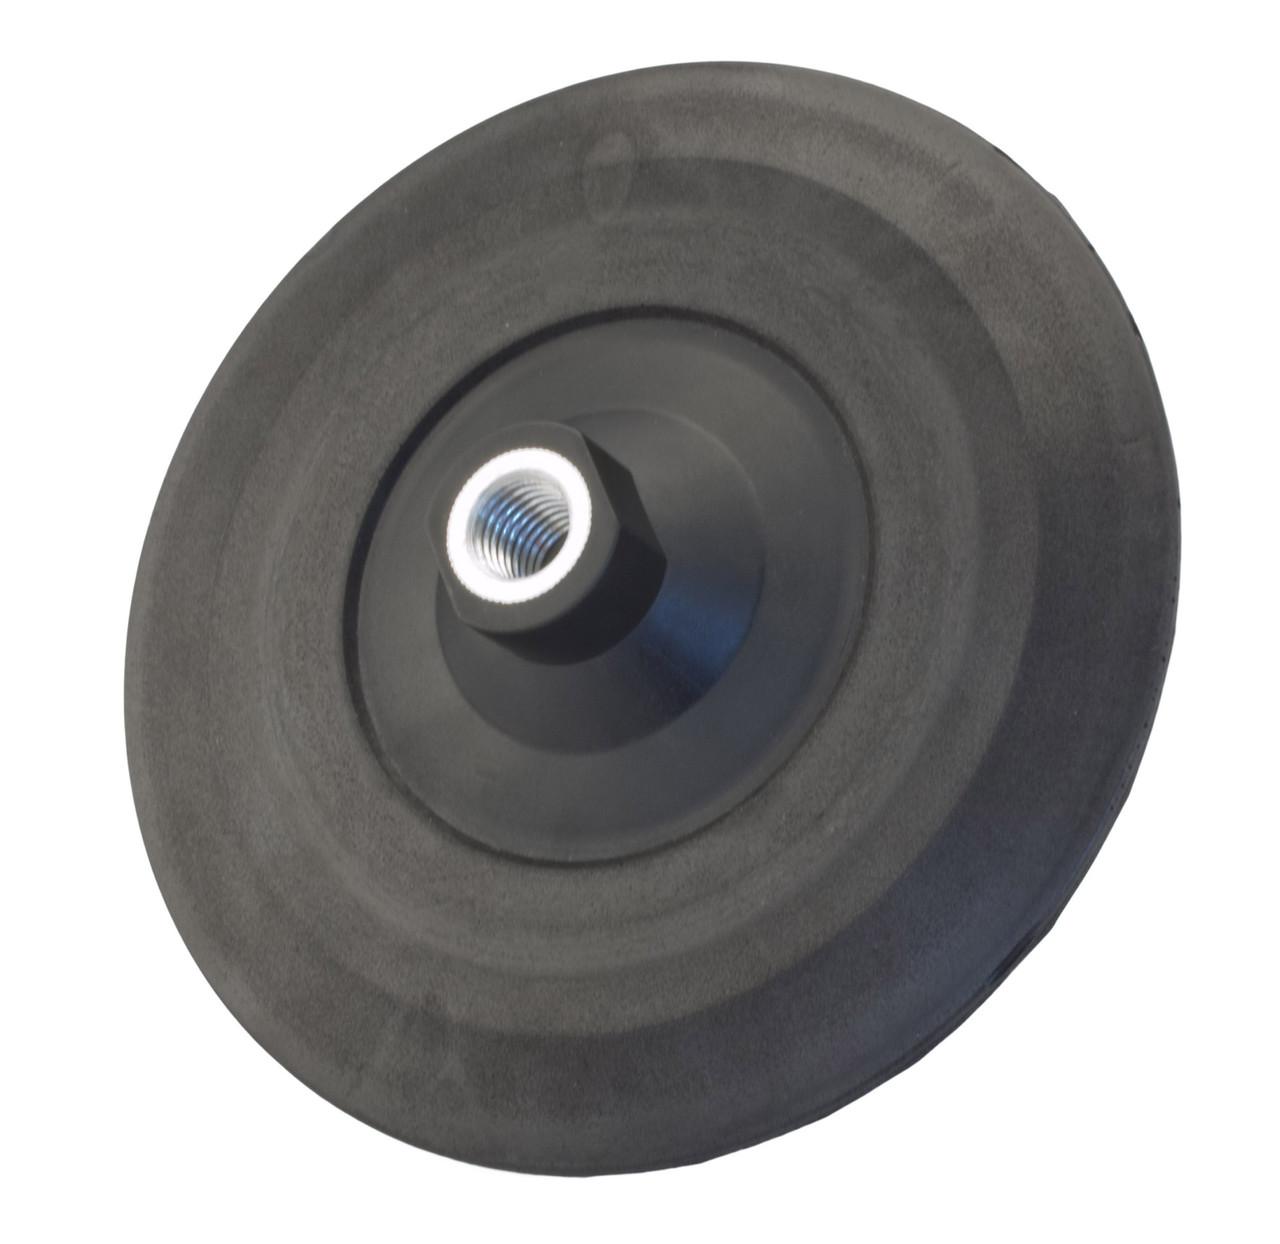 "Оправка для роторной машинки америка - Flexipads USA Pro Rotary Backing Plate М14 150 мм. 6"" черная (MG605)"